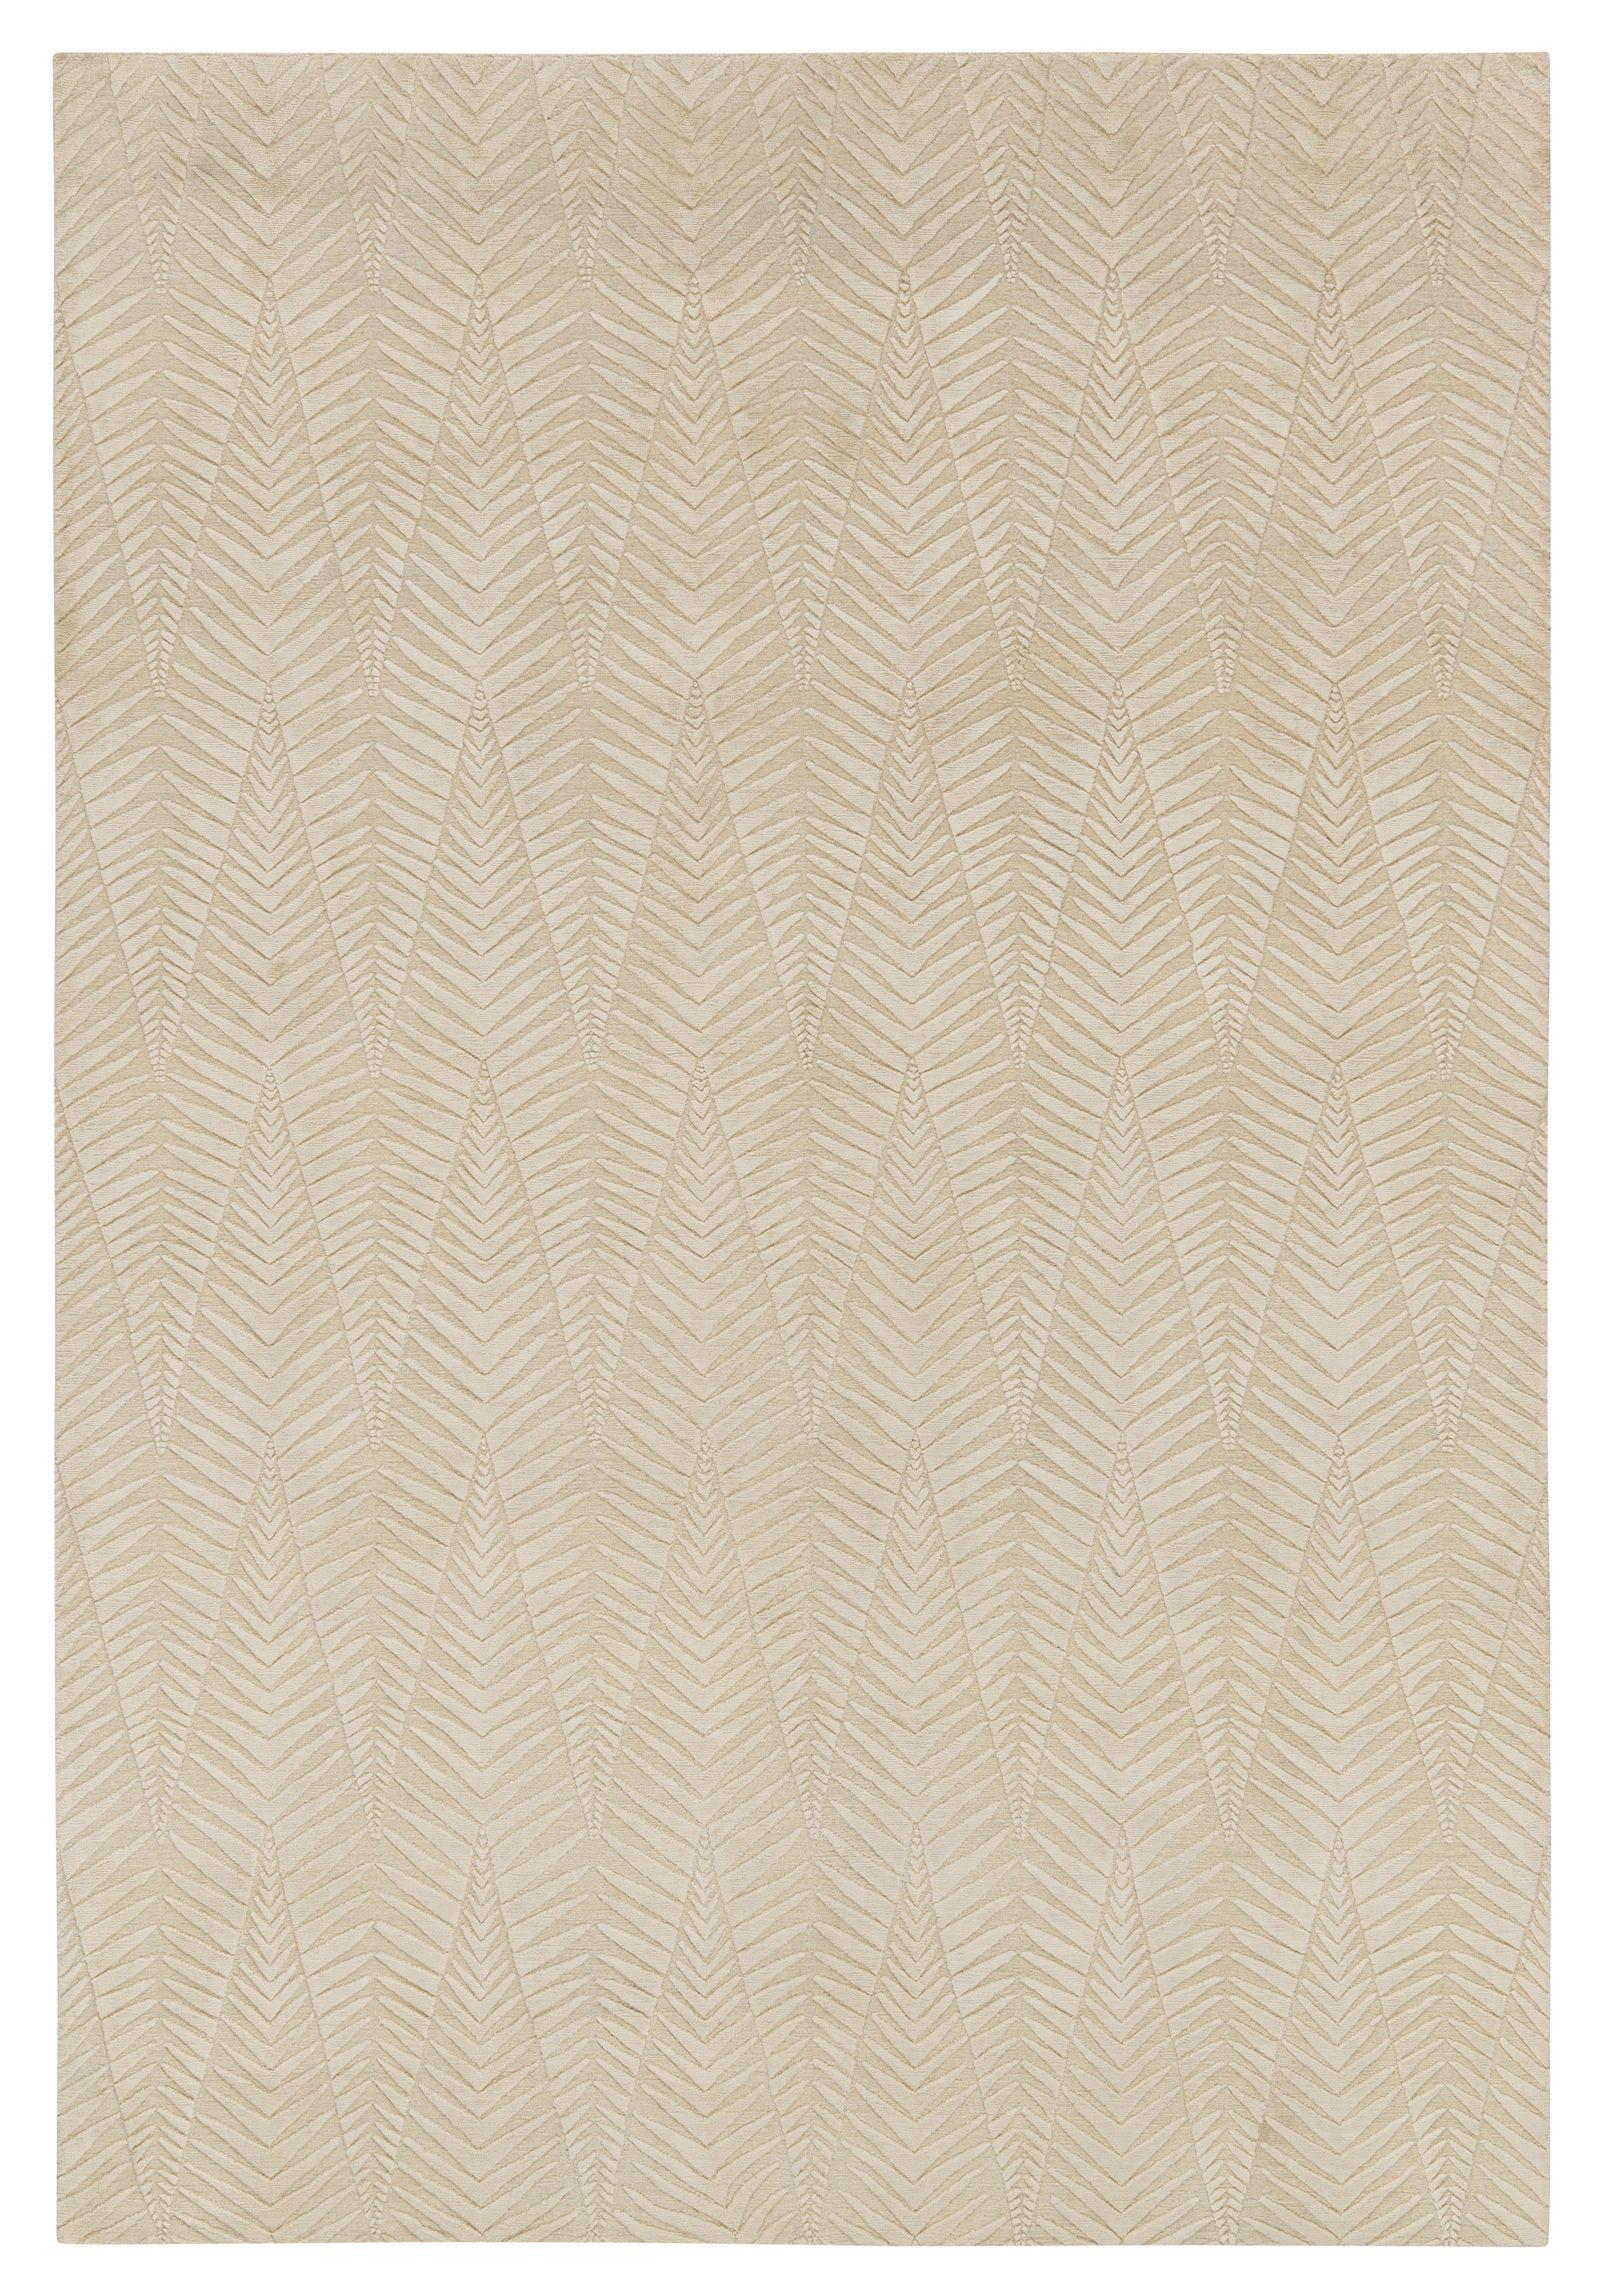 Zebra Pale By Neisha Crosland Wool And Silk Contemporary Rugs